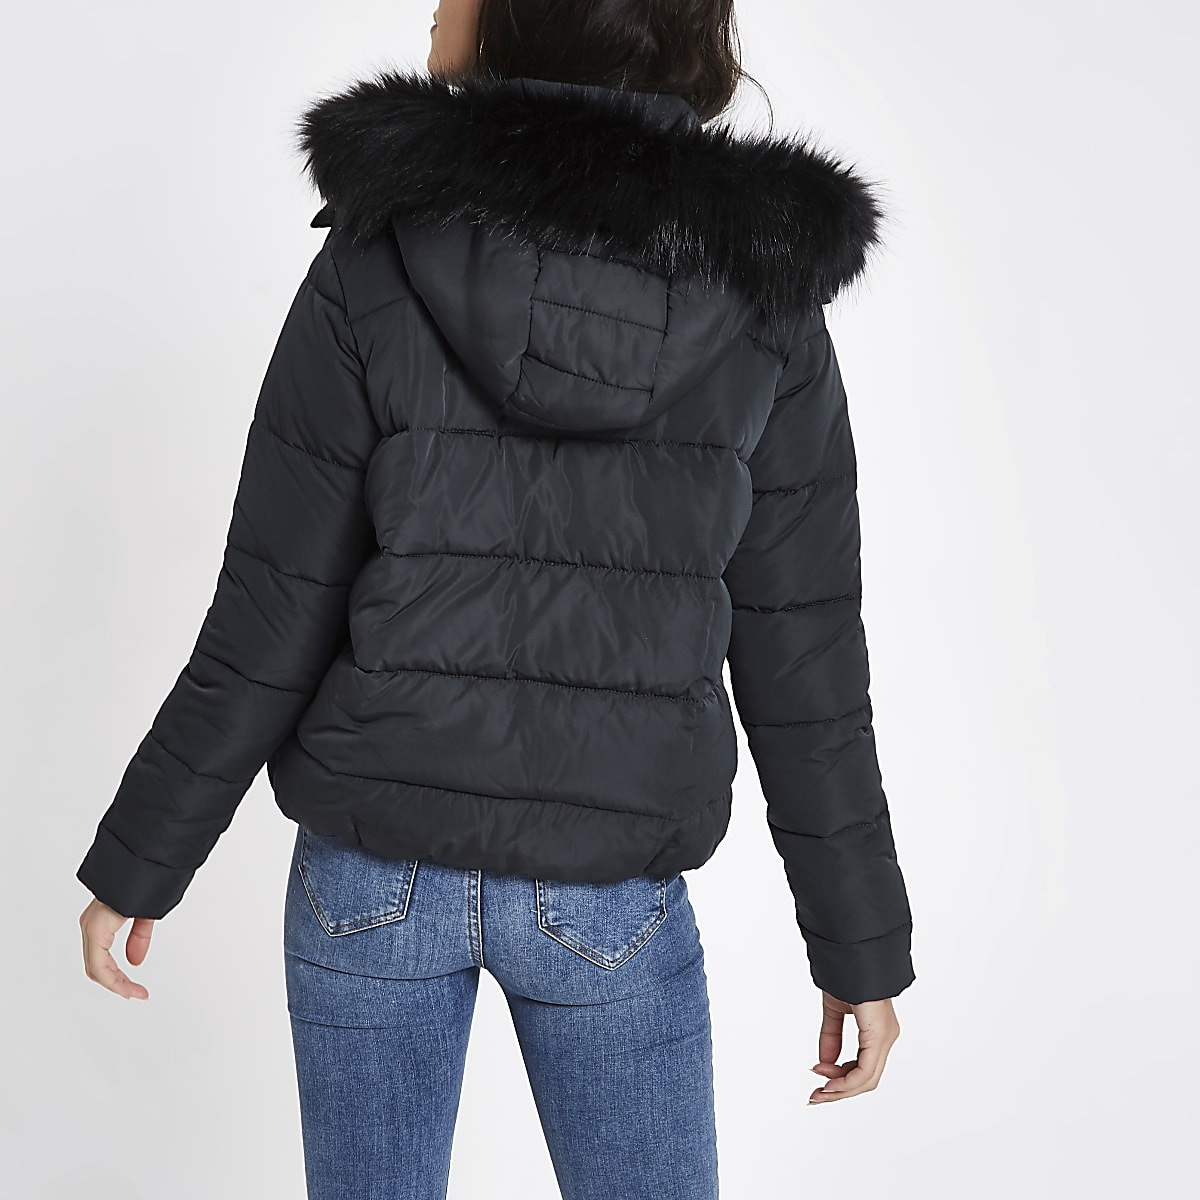 353ad2503d0 Navy padded faux fur hood puffer jacket - Jackets - Coats & Jackets ...